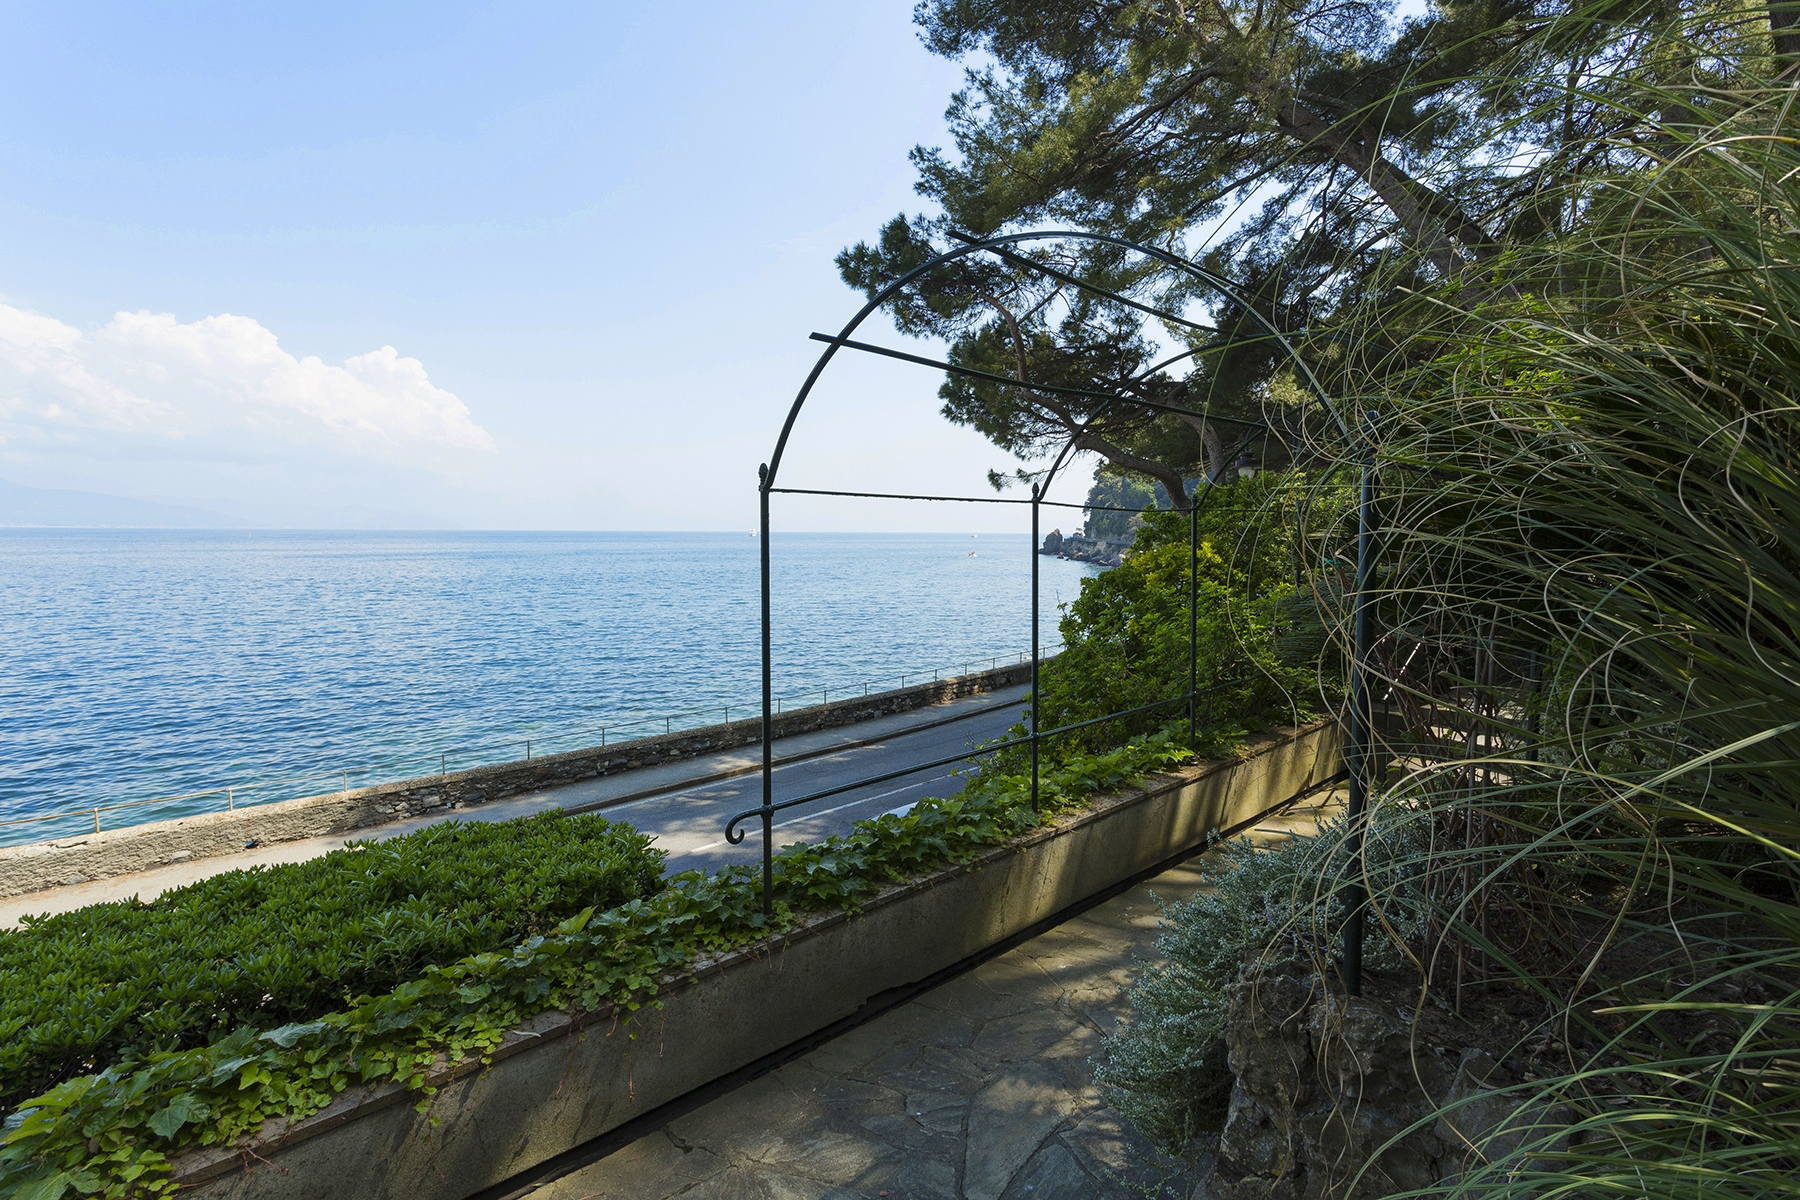 Villa in Vendita a Santa Margherita Ligure: 5 locali, 580 mq - Foto 3